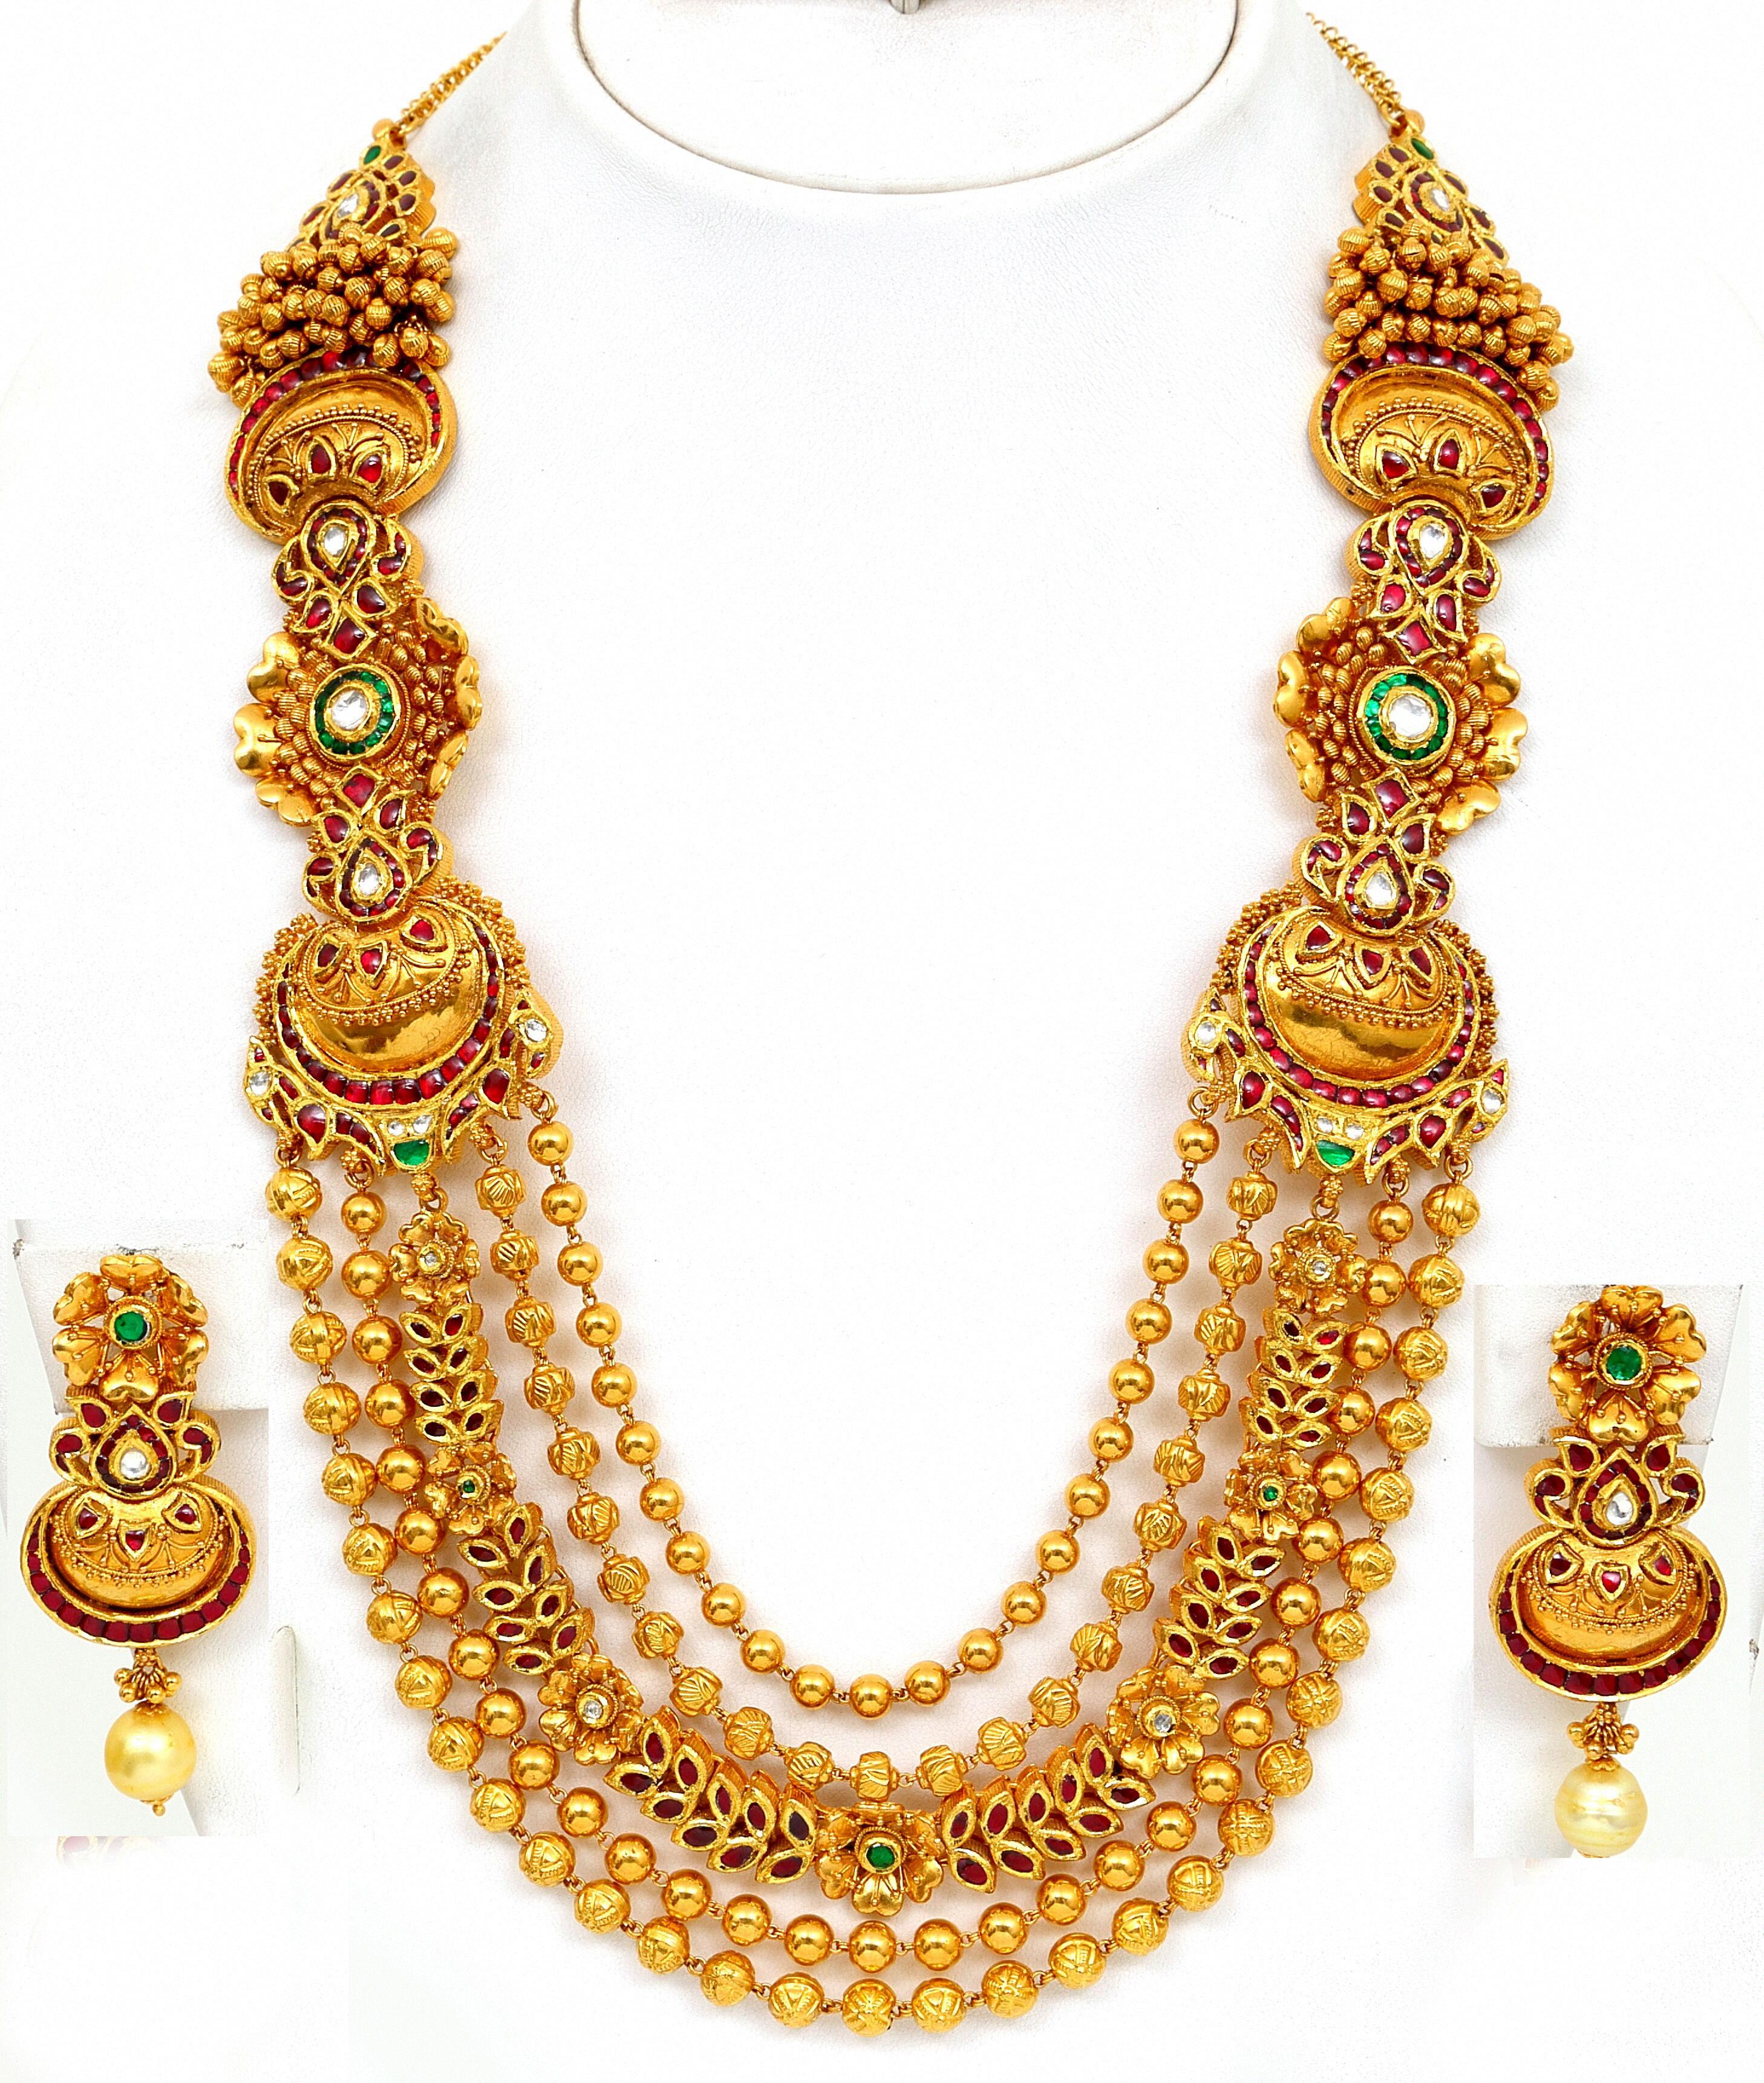 Discounts in Airoli, Mumbai on Jewellery|Diamond|Silver|Gold ...